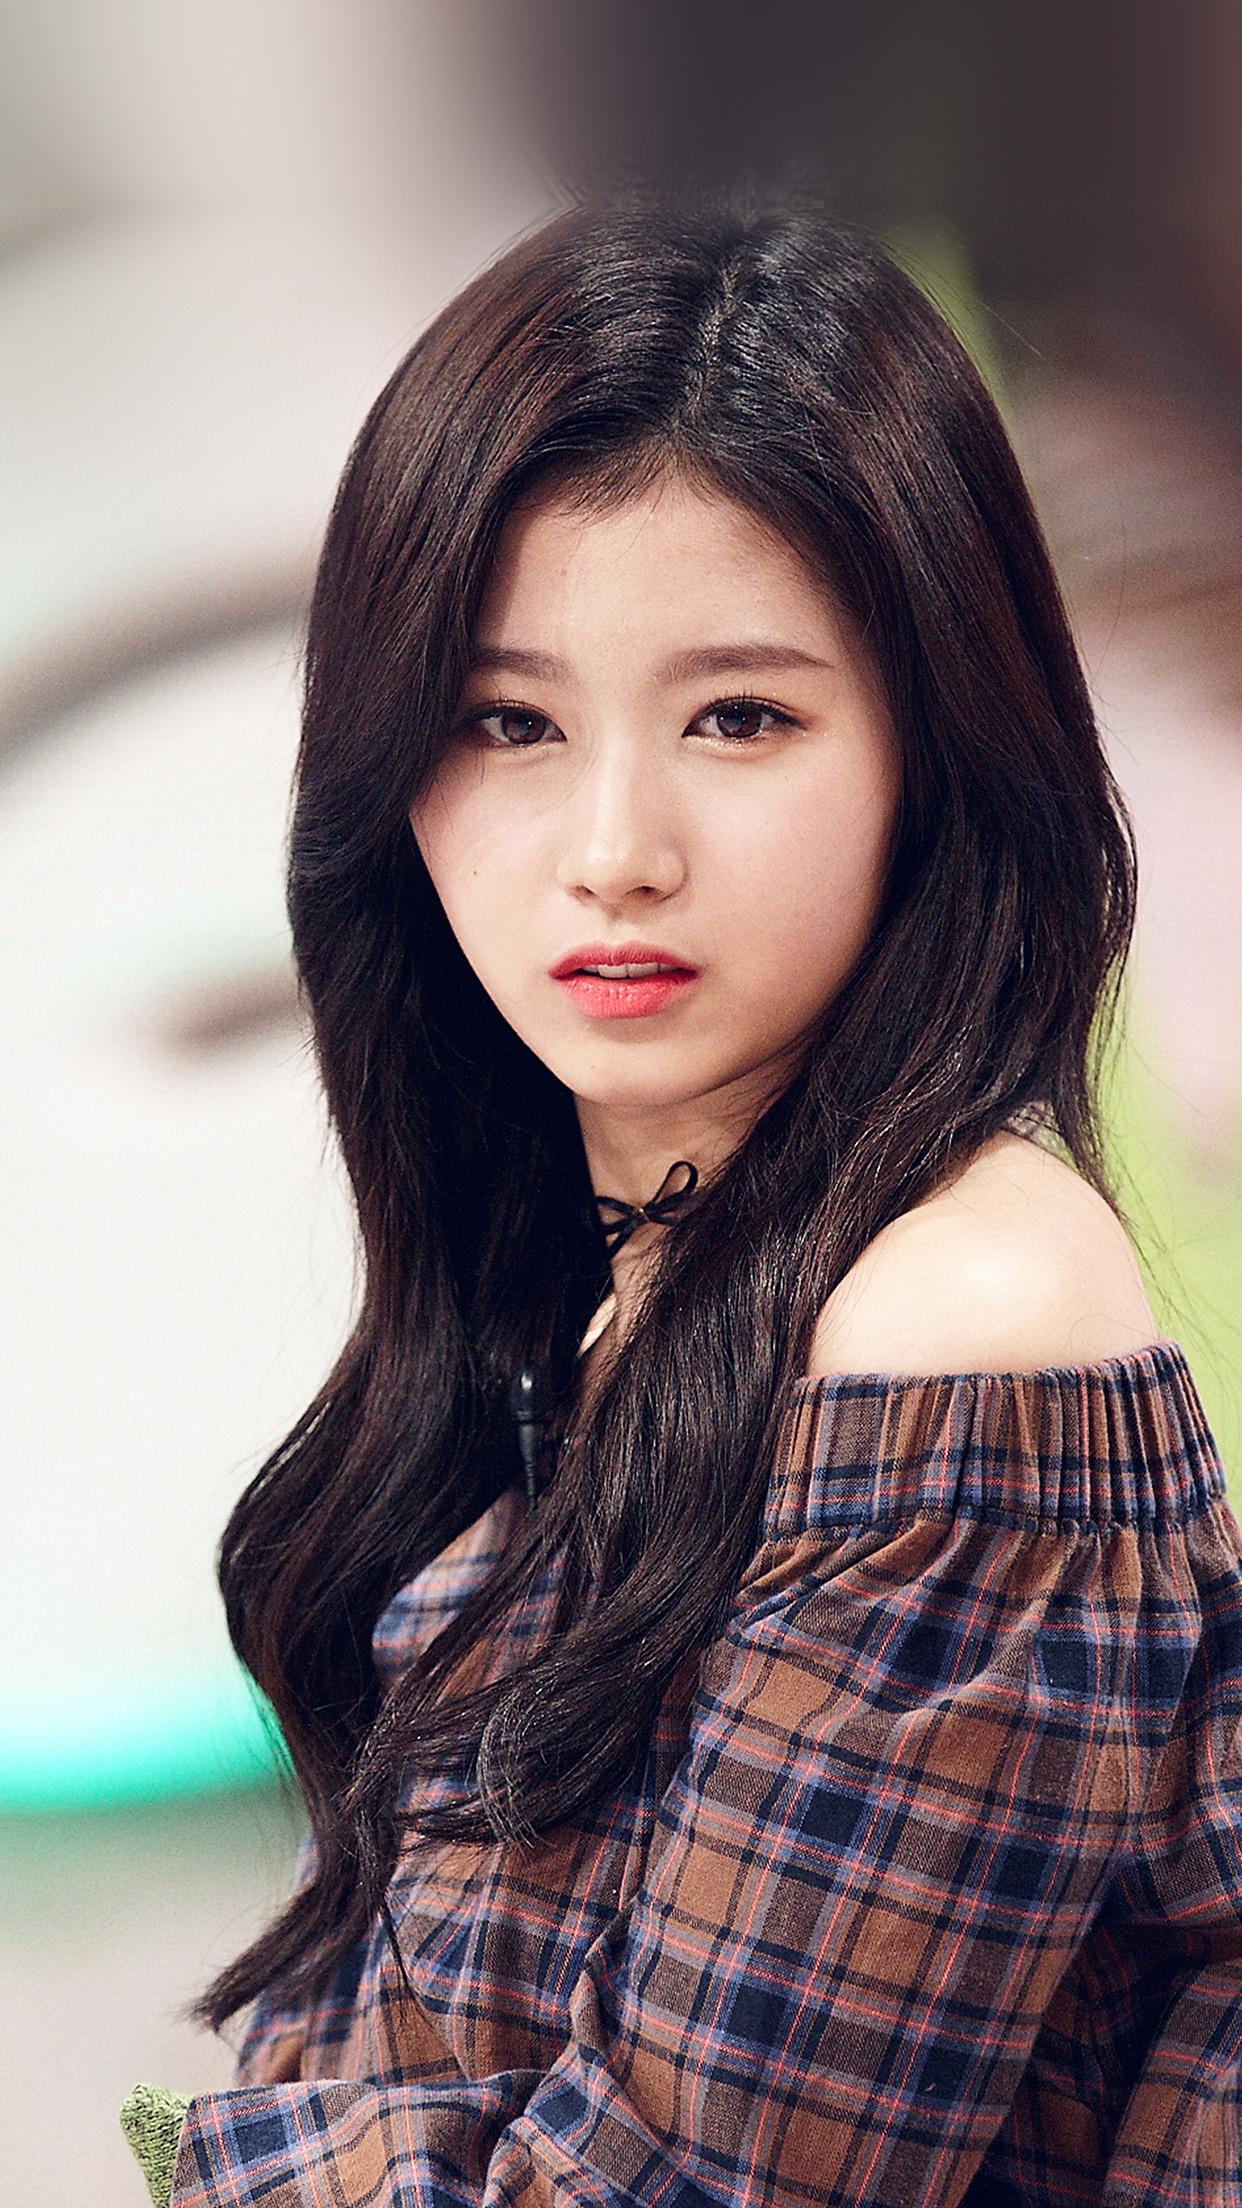 Cute Pattern Iphone 5 Wallpaper I Love Papers Hl09 Sana Kpop Cute Girl Celebrity